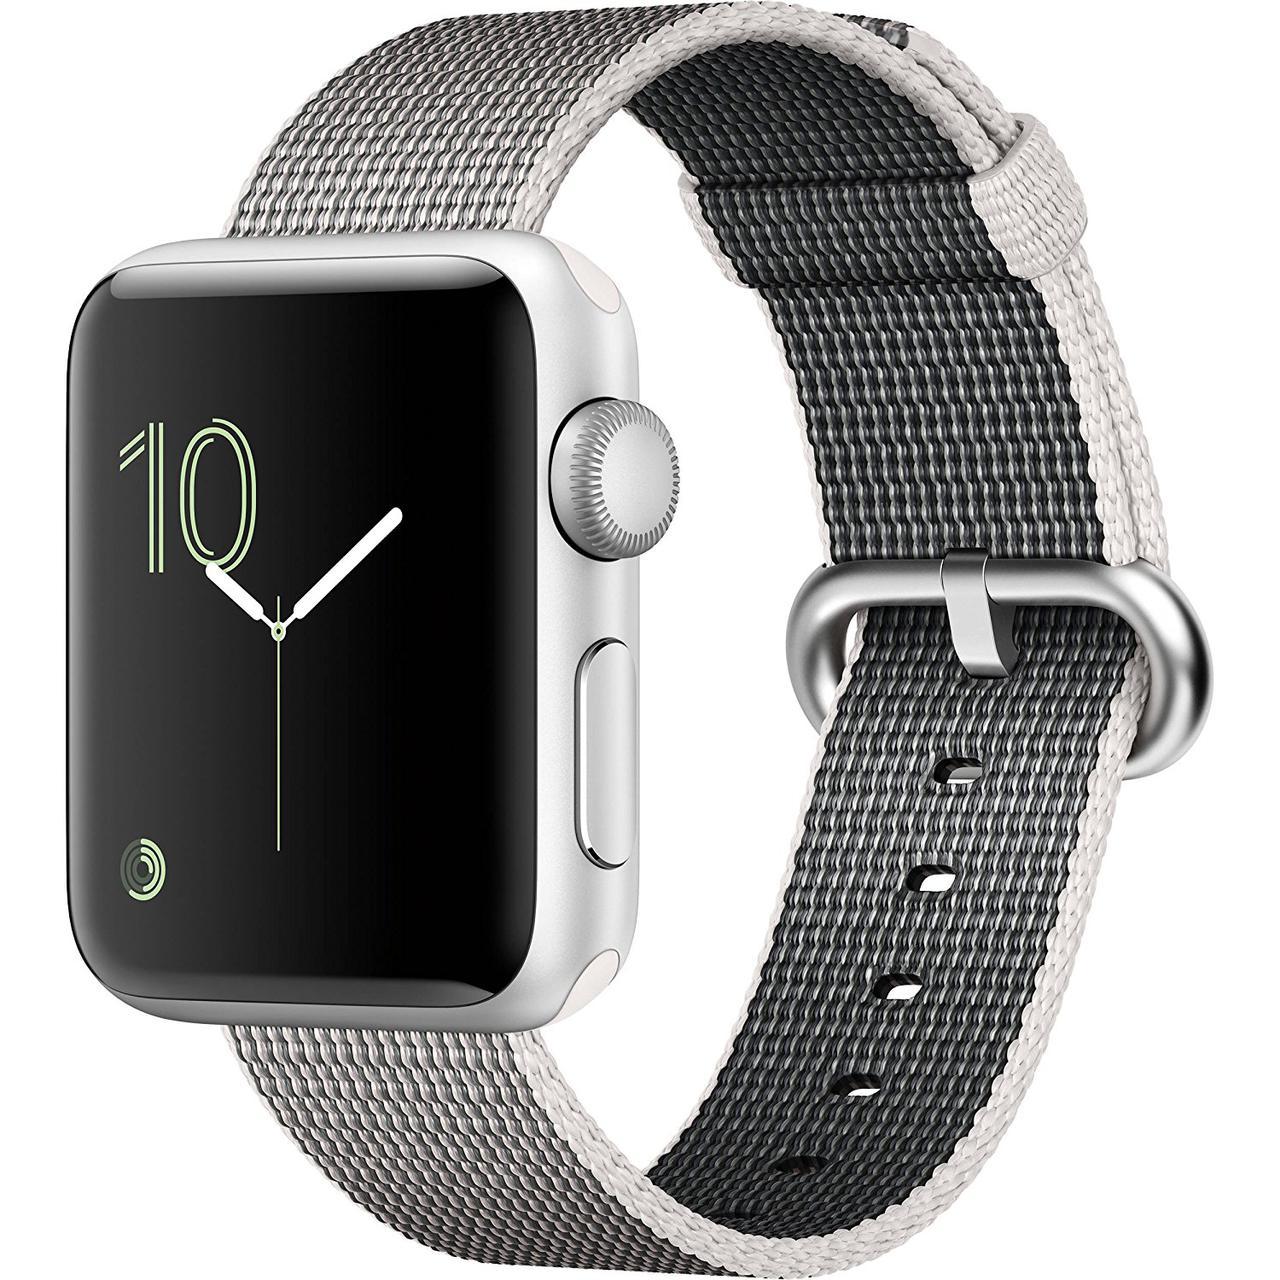 Apple watch series 2 sport 42mm vs apple watch edition series 2 42mm.